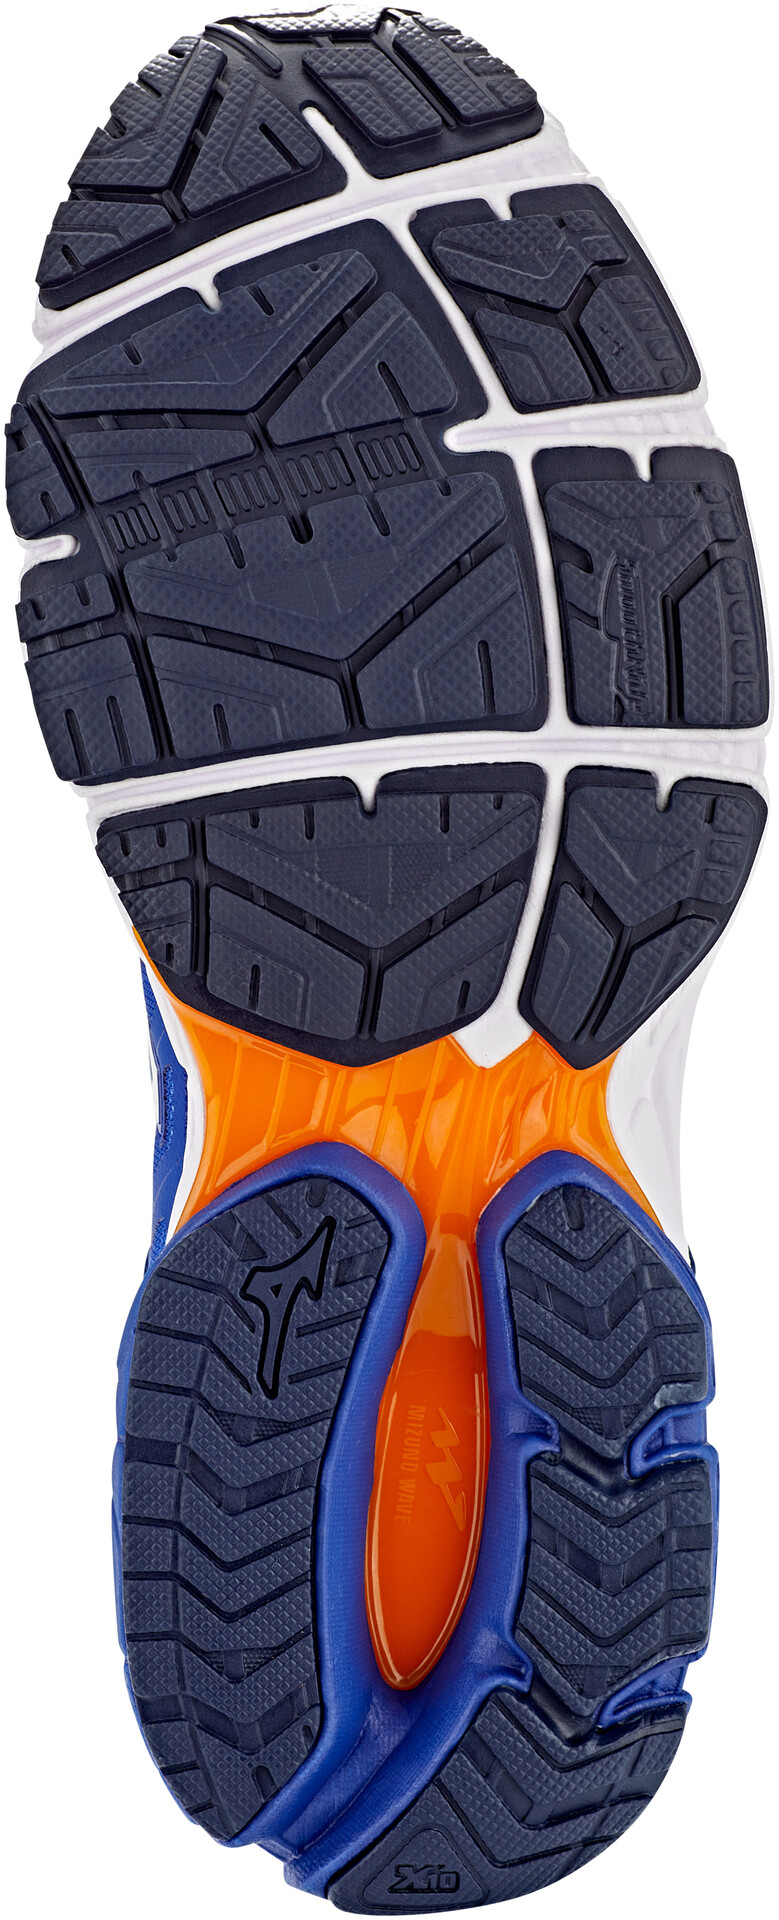 Mizuno Wave Ultima 11 Chaussures de running Homme, true bluewhitedress blues